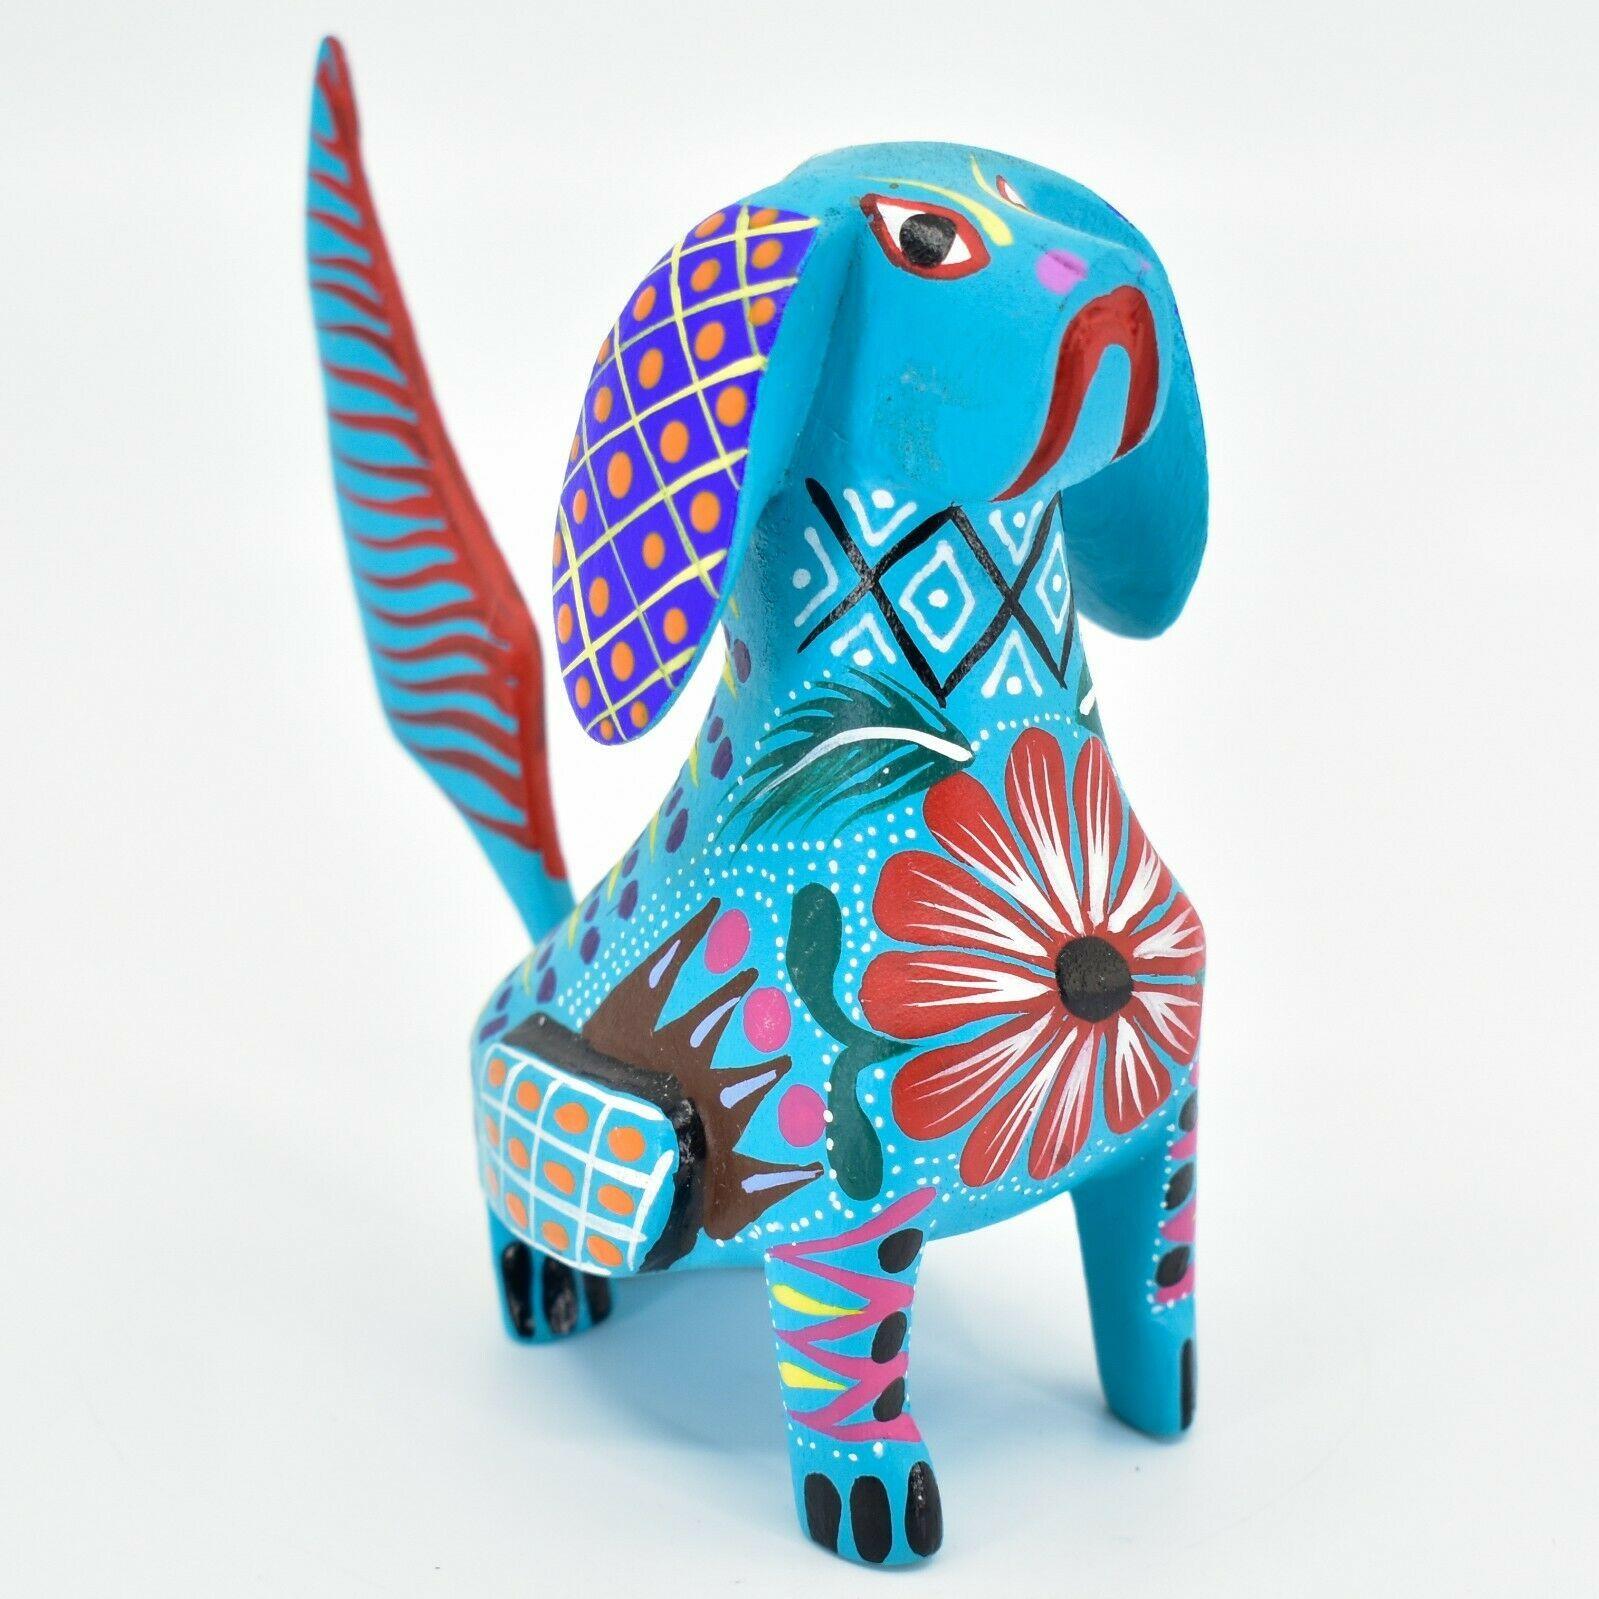 Handmade Alebrije Oaxacan Wood Carving Painted Folk Art Angry Face Dog Figurine